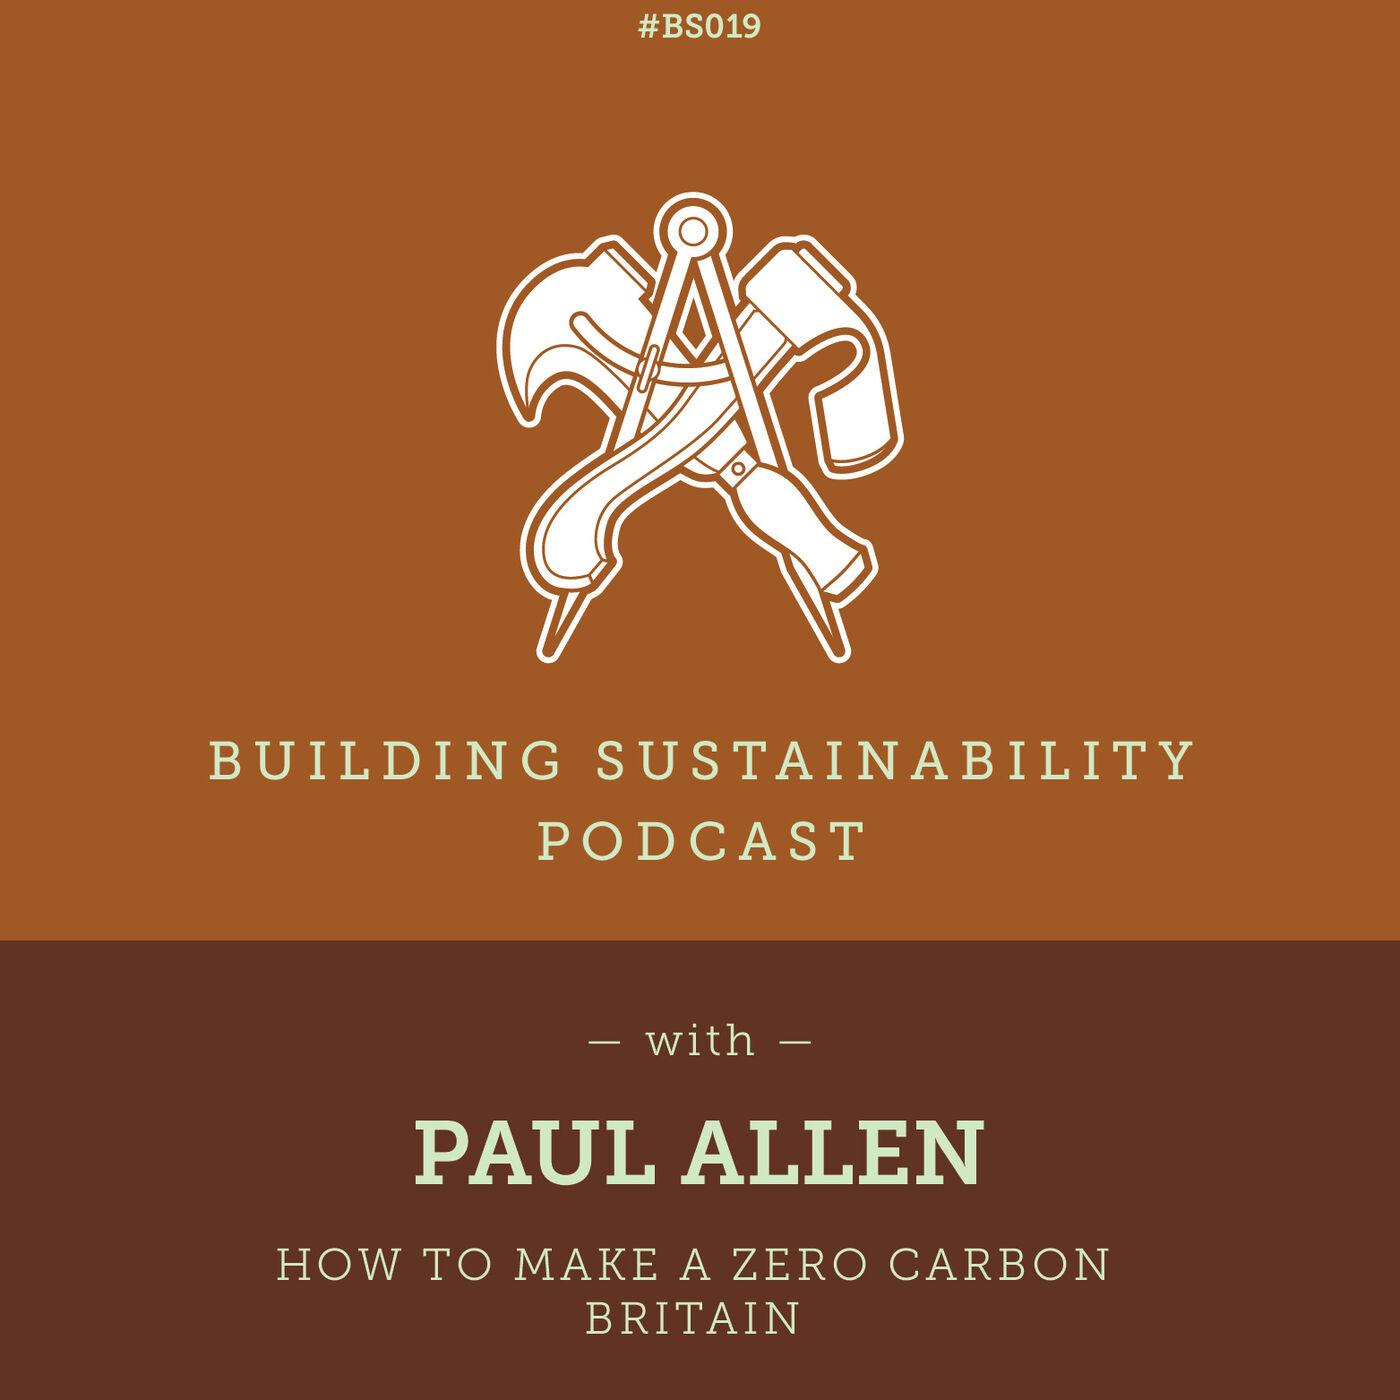 How to make a Zero Carbon Britain - Paul Allen - BS019